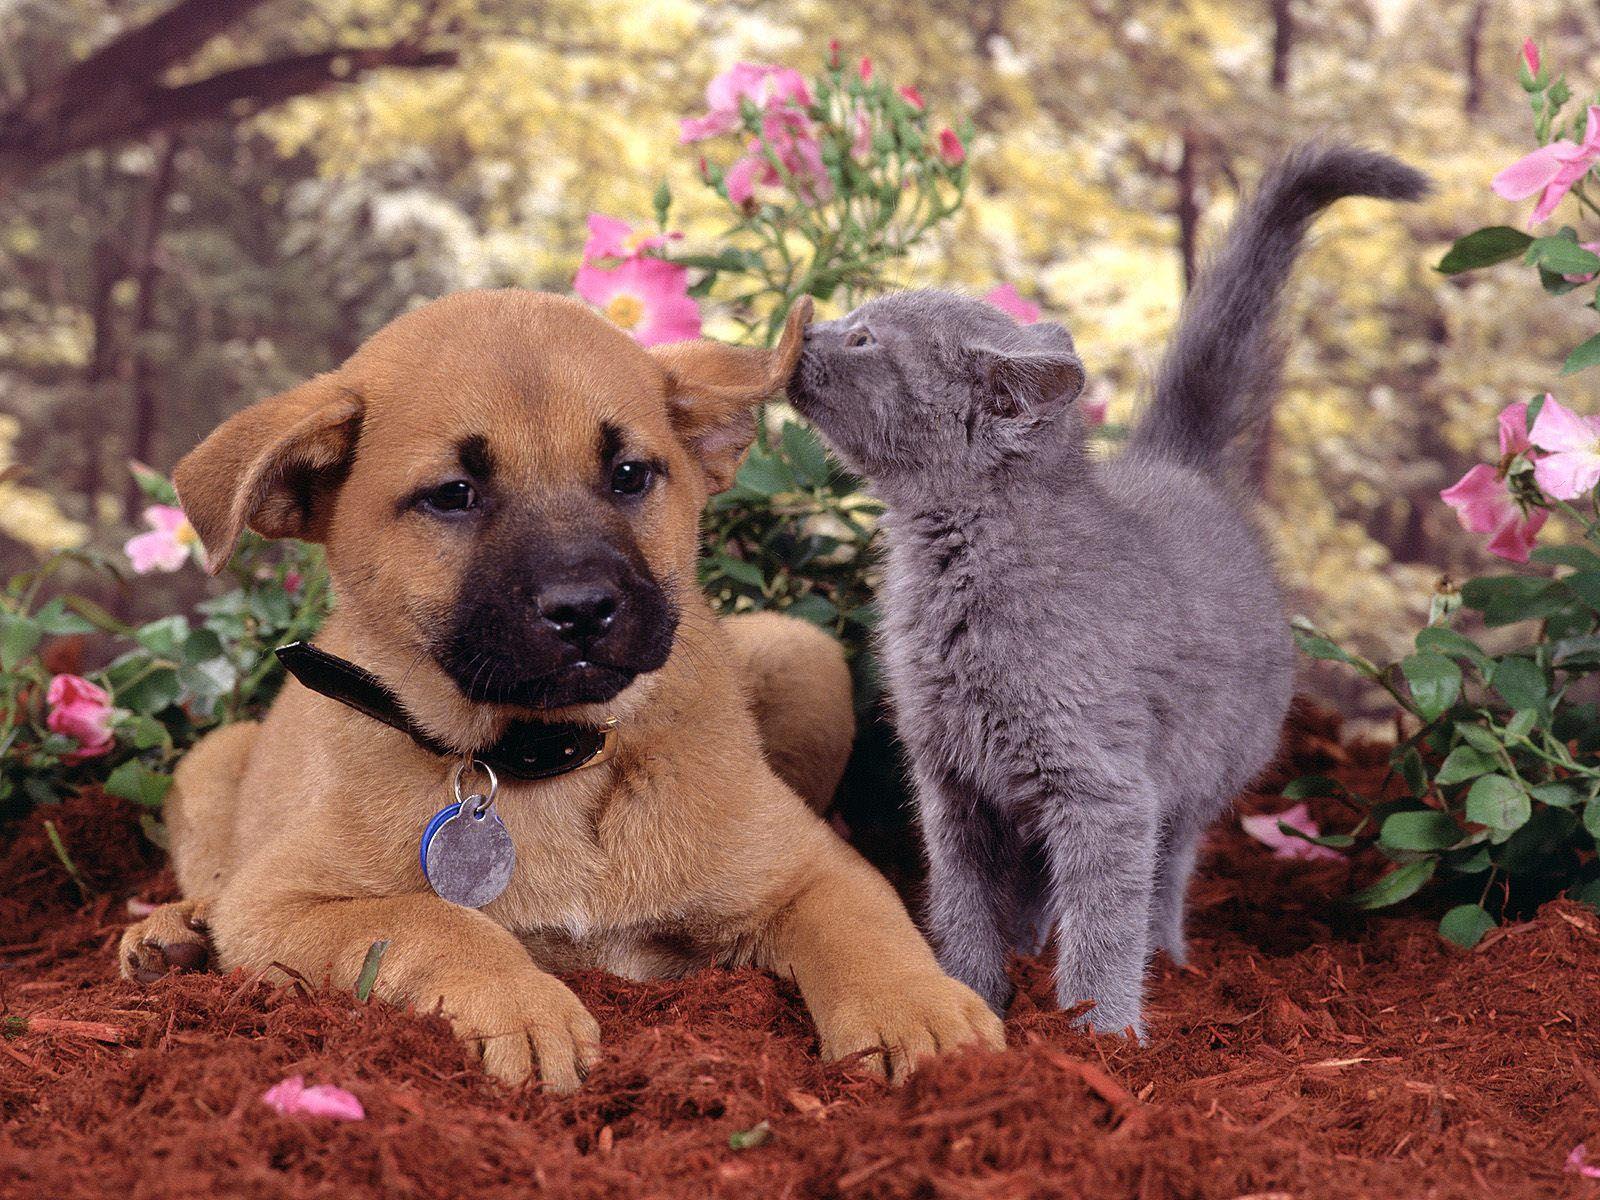 Best Cute Dog N Cat Wallpapers - 7dbd04d091d74dabec2dde655d804296  Gallery_689557 .jpg